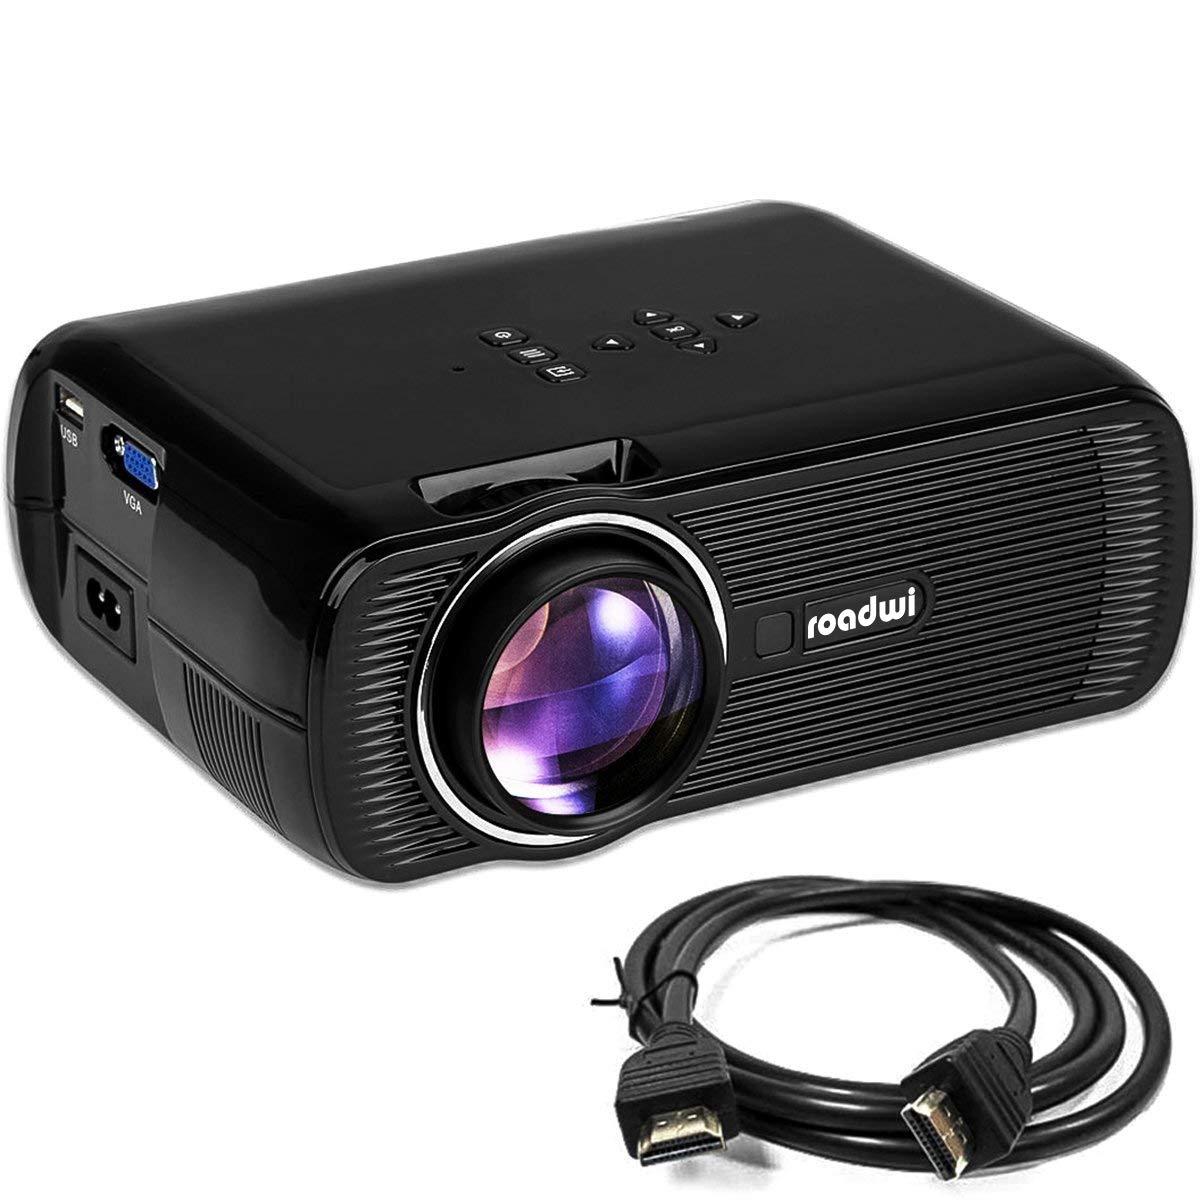 Roadwi Video Mini Portable Projector, 1500 lumens, Support 1080P HDMI AV VGA USB SD TV Multimedia Home Theater Games Family Movie Night Party Travel